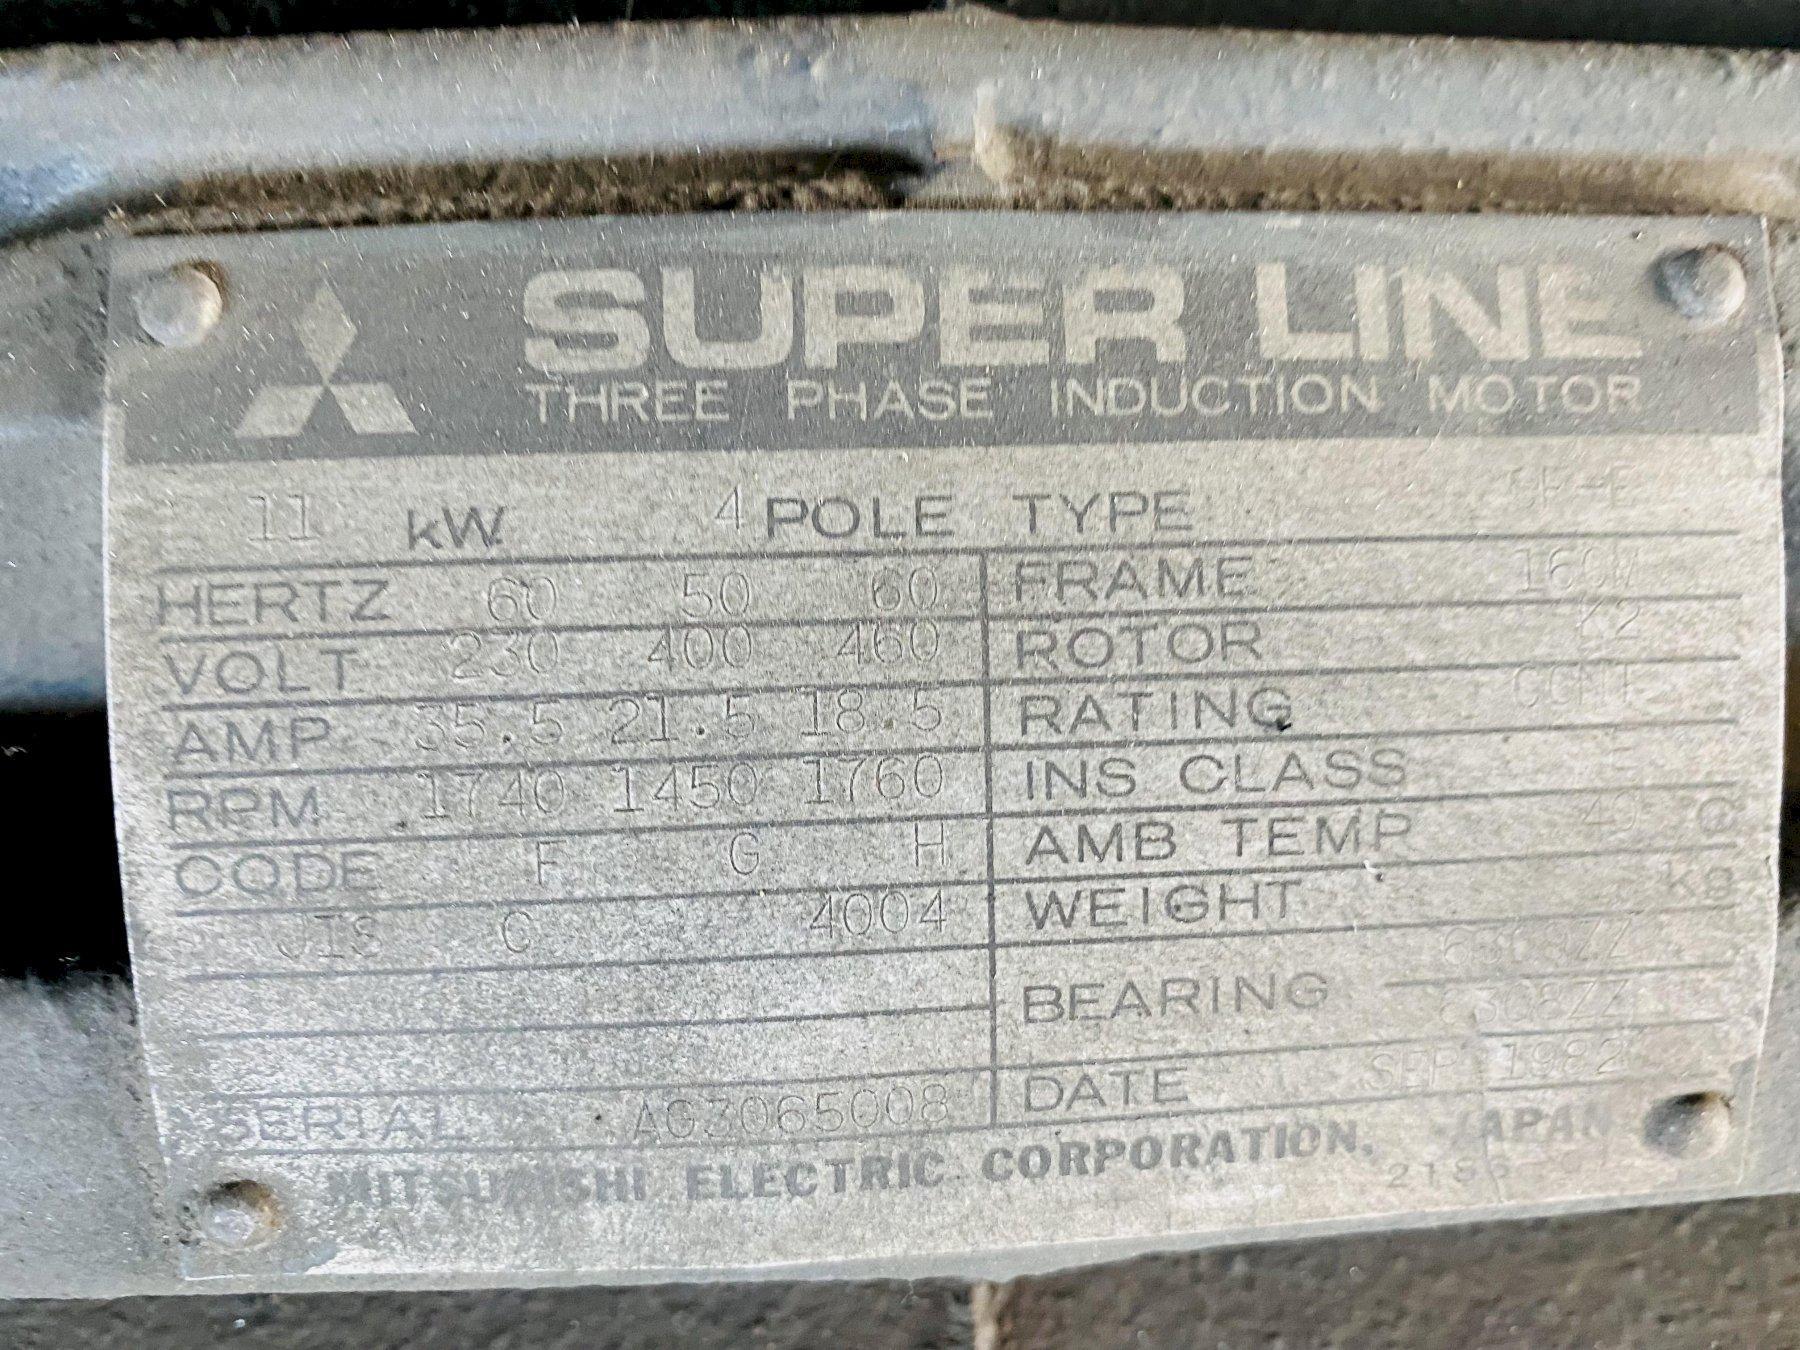 "10' x 1/4"" AMADA M-3060 MECHANICAL SHEAR. STOCK # 0416921"